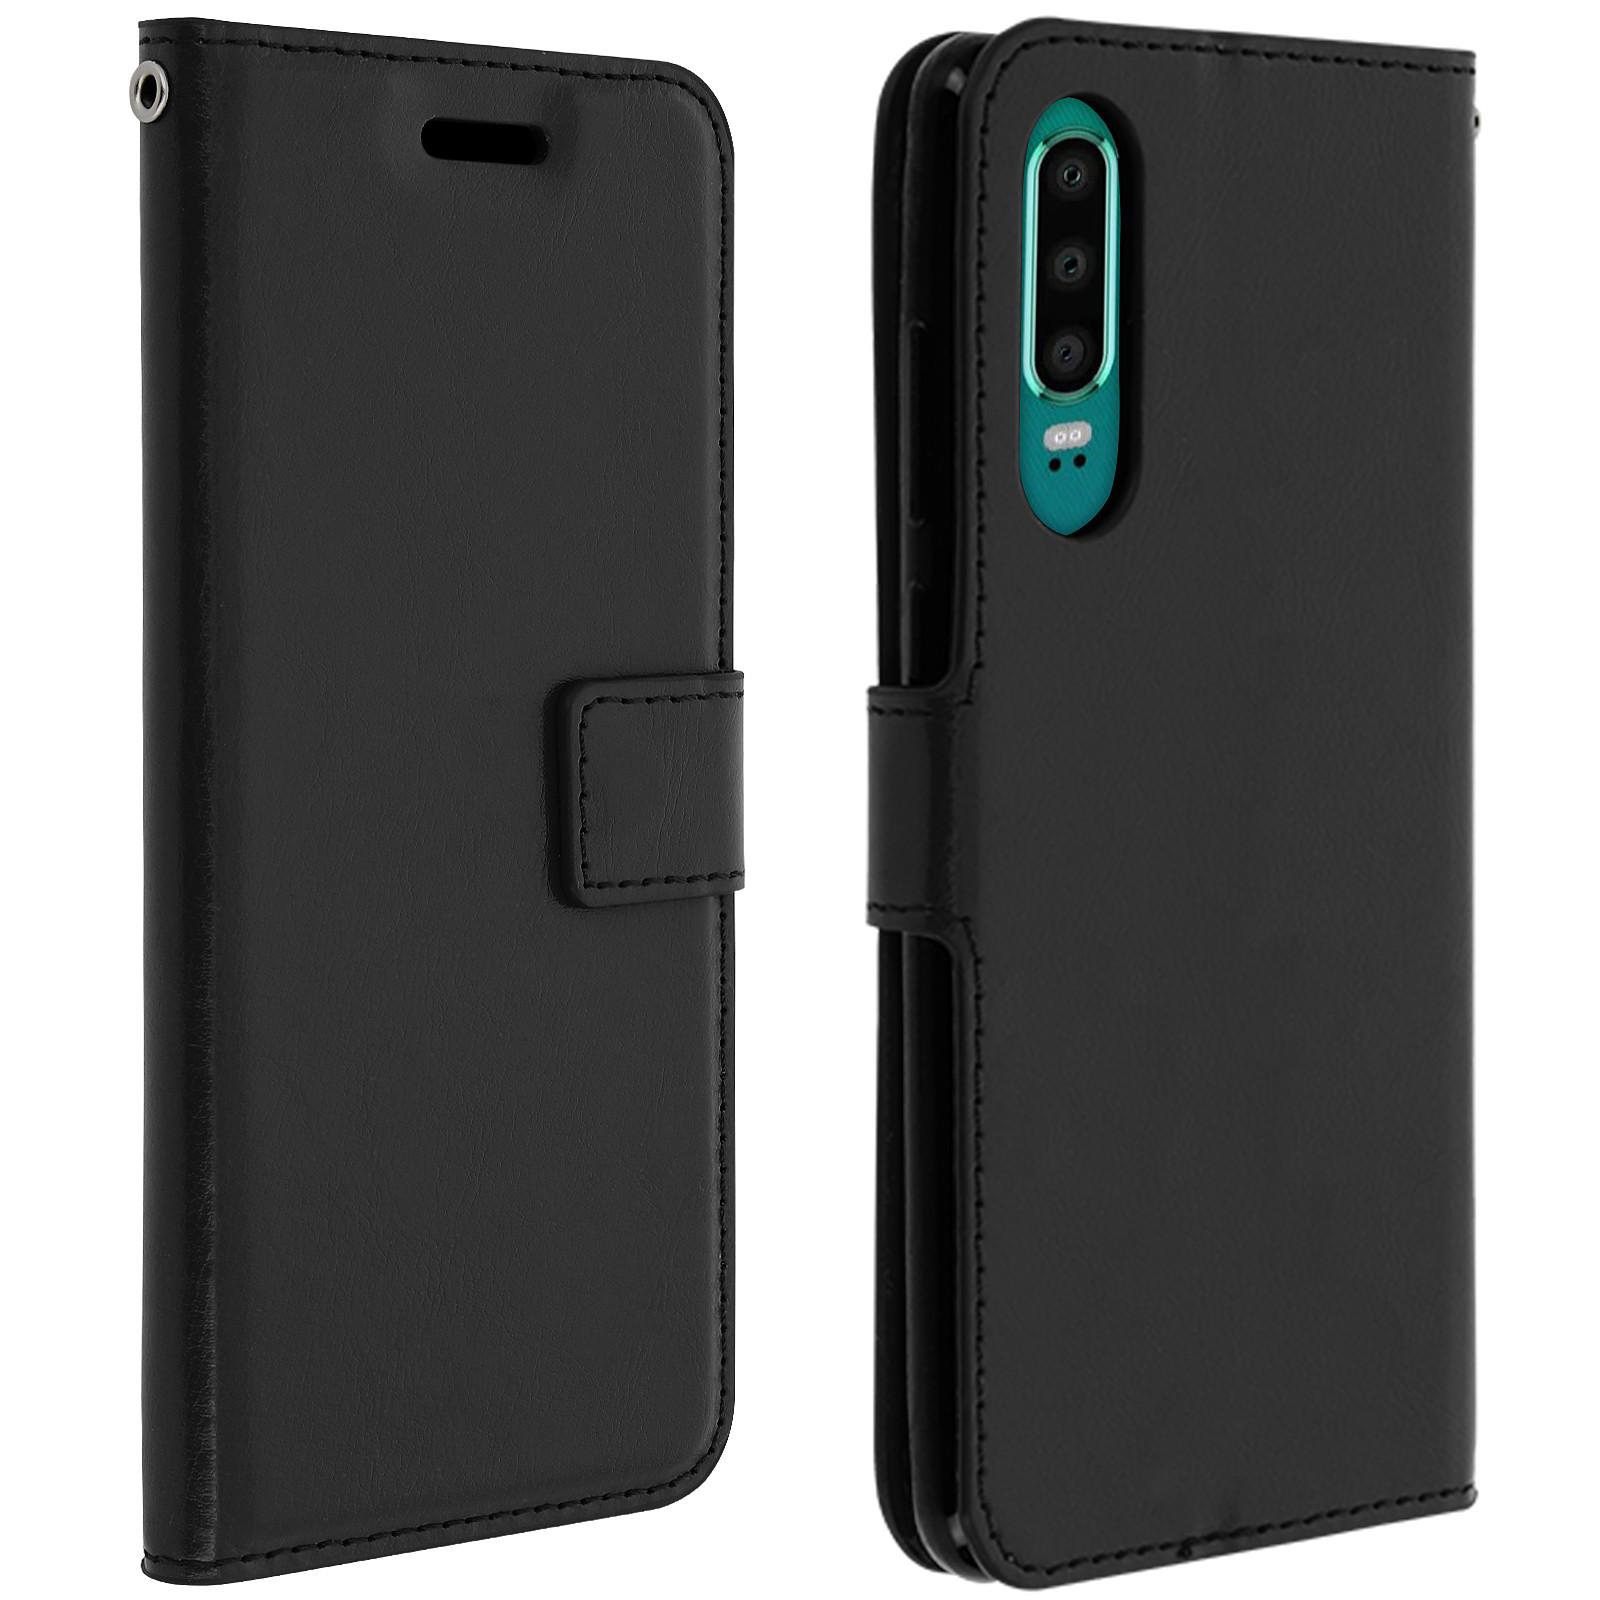 Avizar Etui folio Noir pour Huawei P30